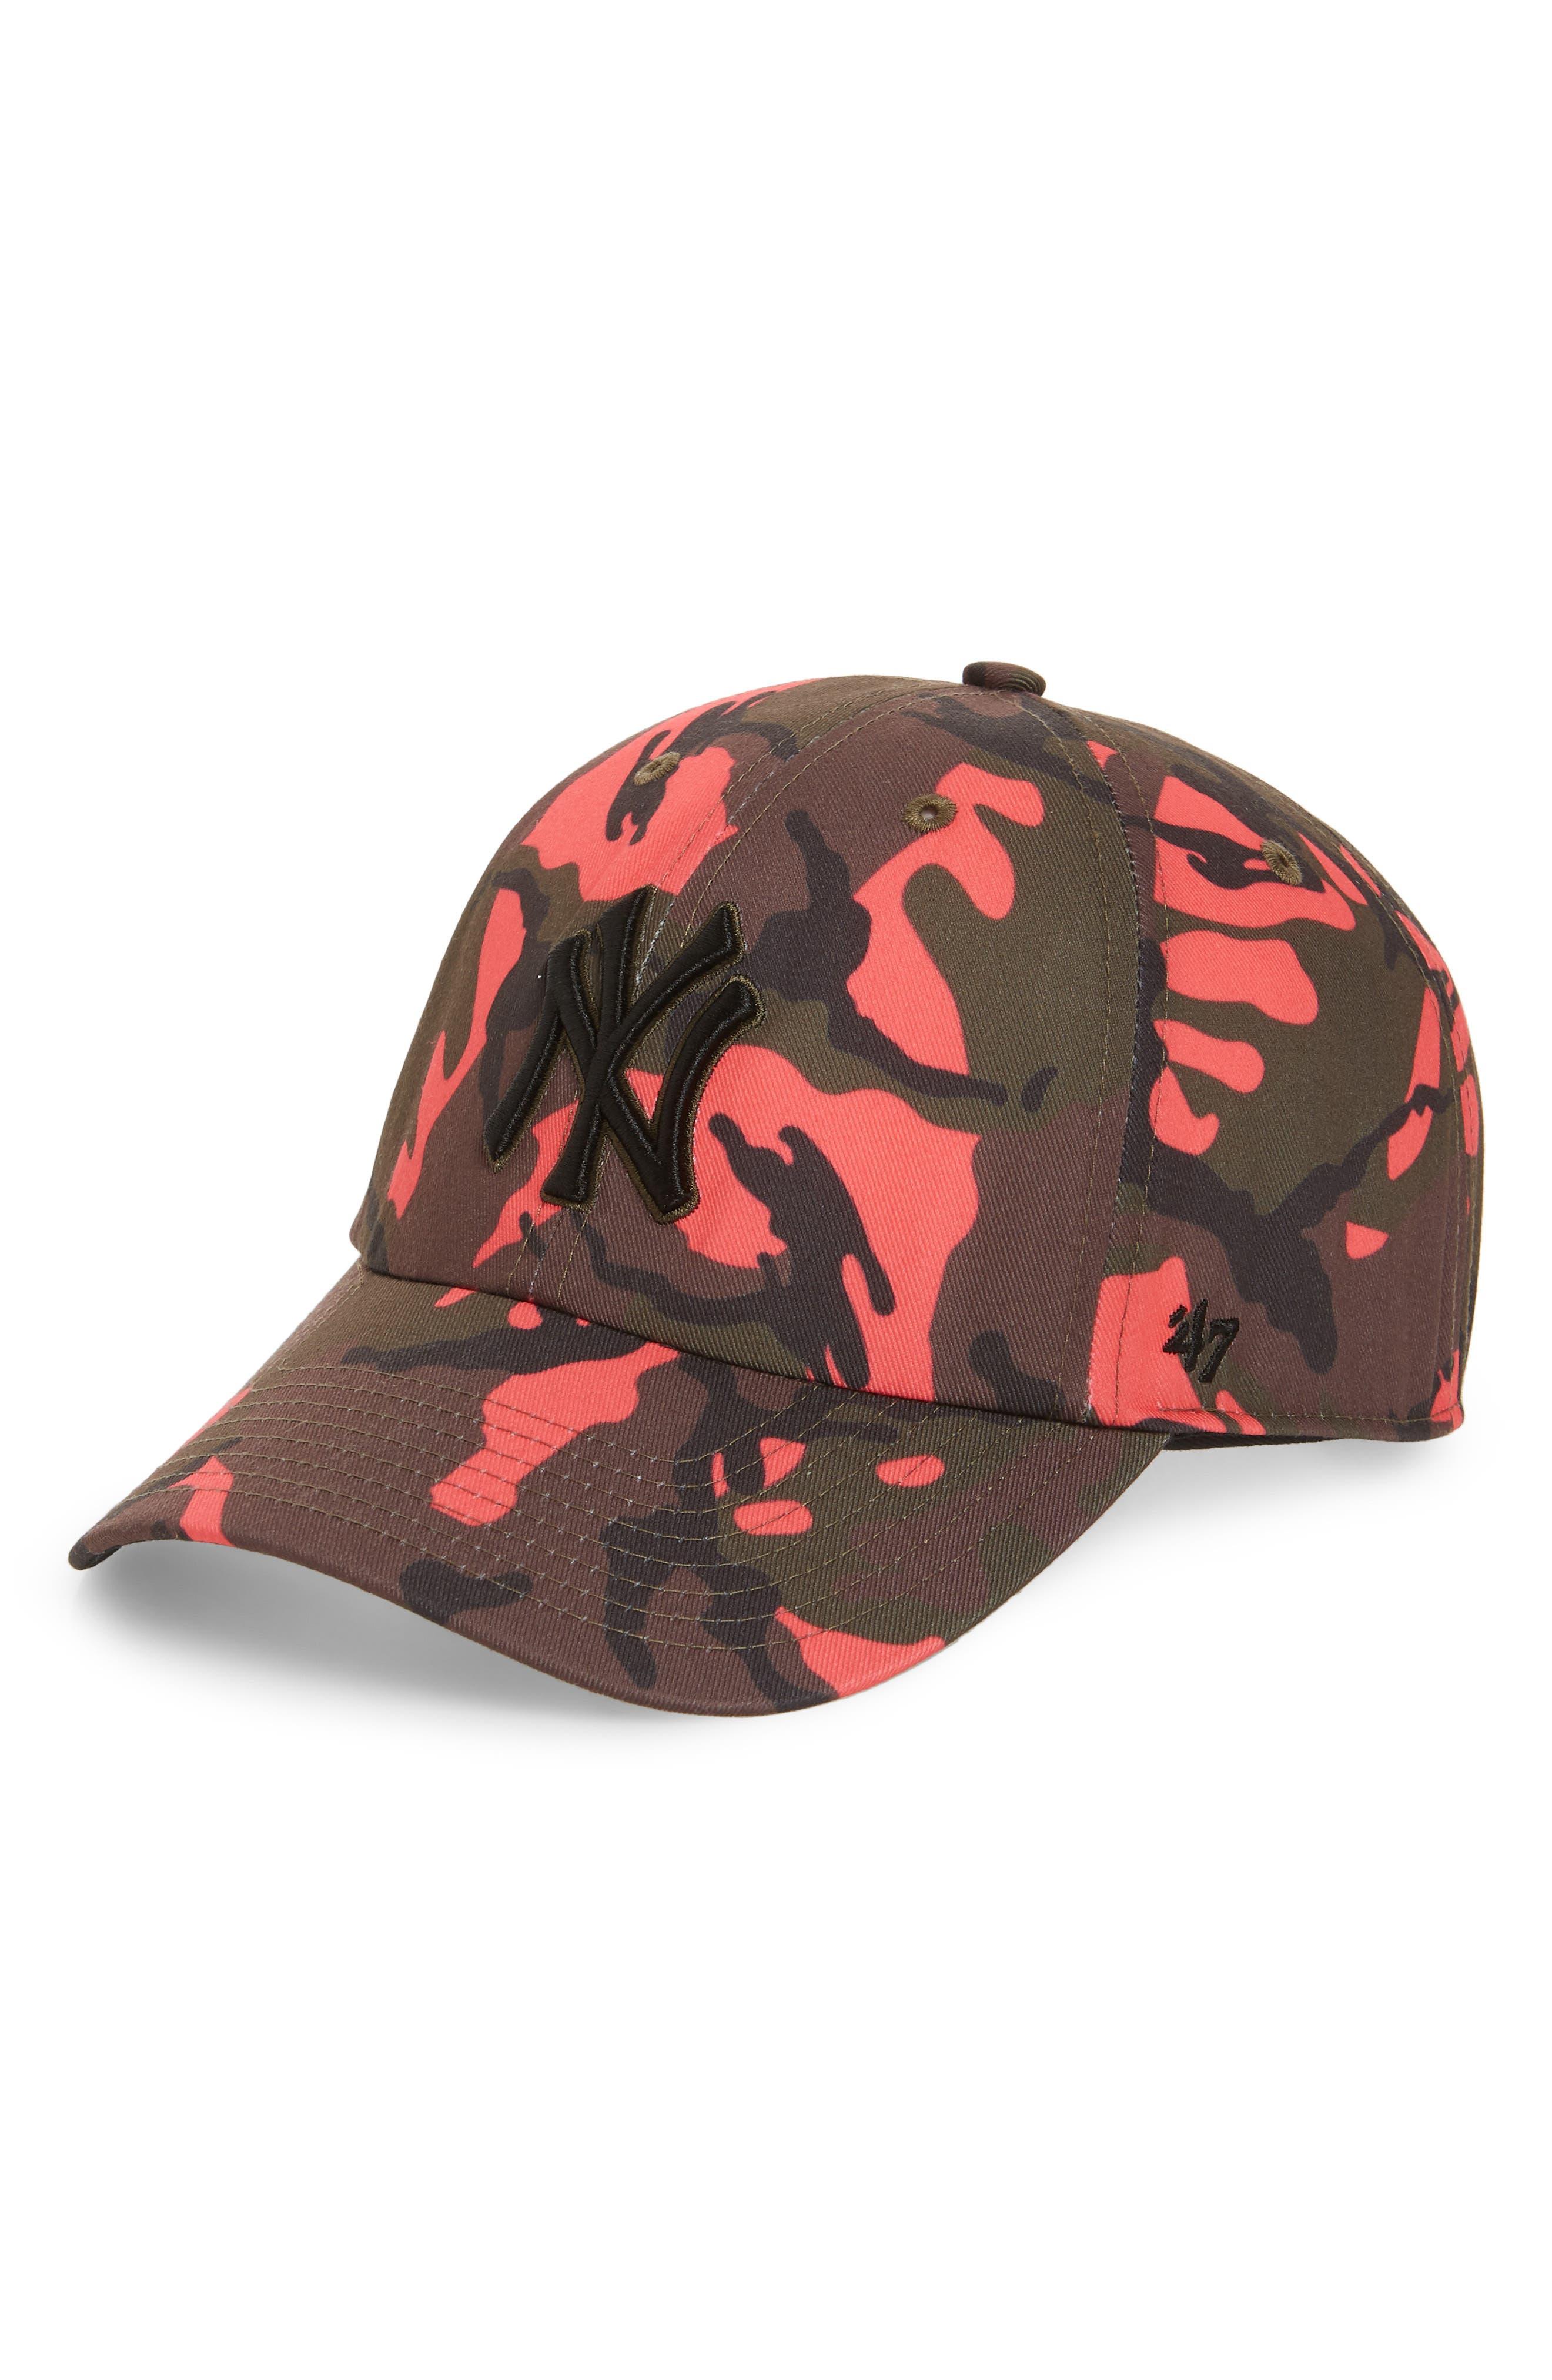 Cameon New York Yankees Camo Baseball Cap,                         Main,                         color, Pink